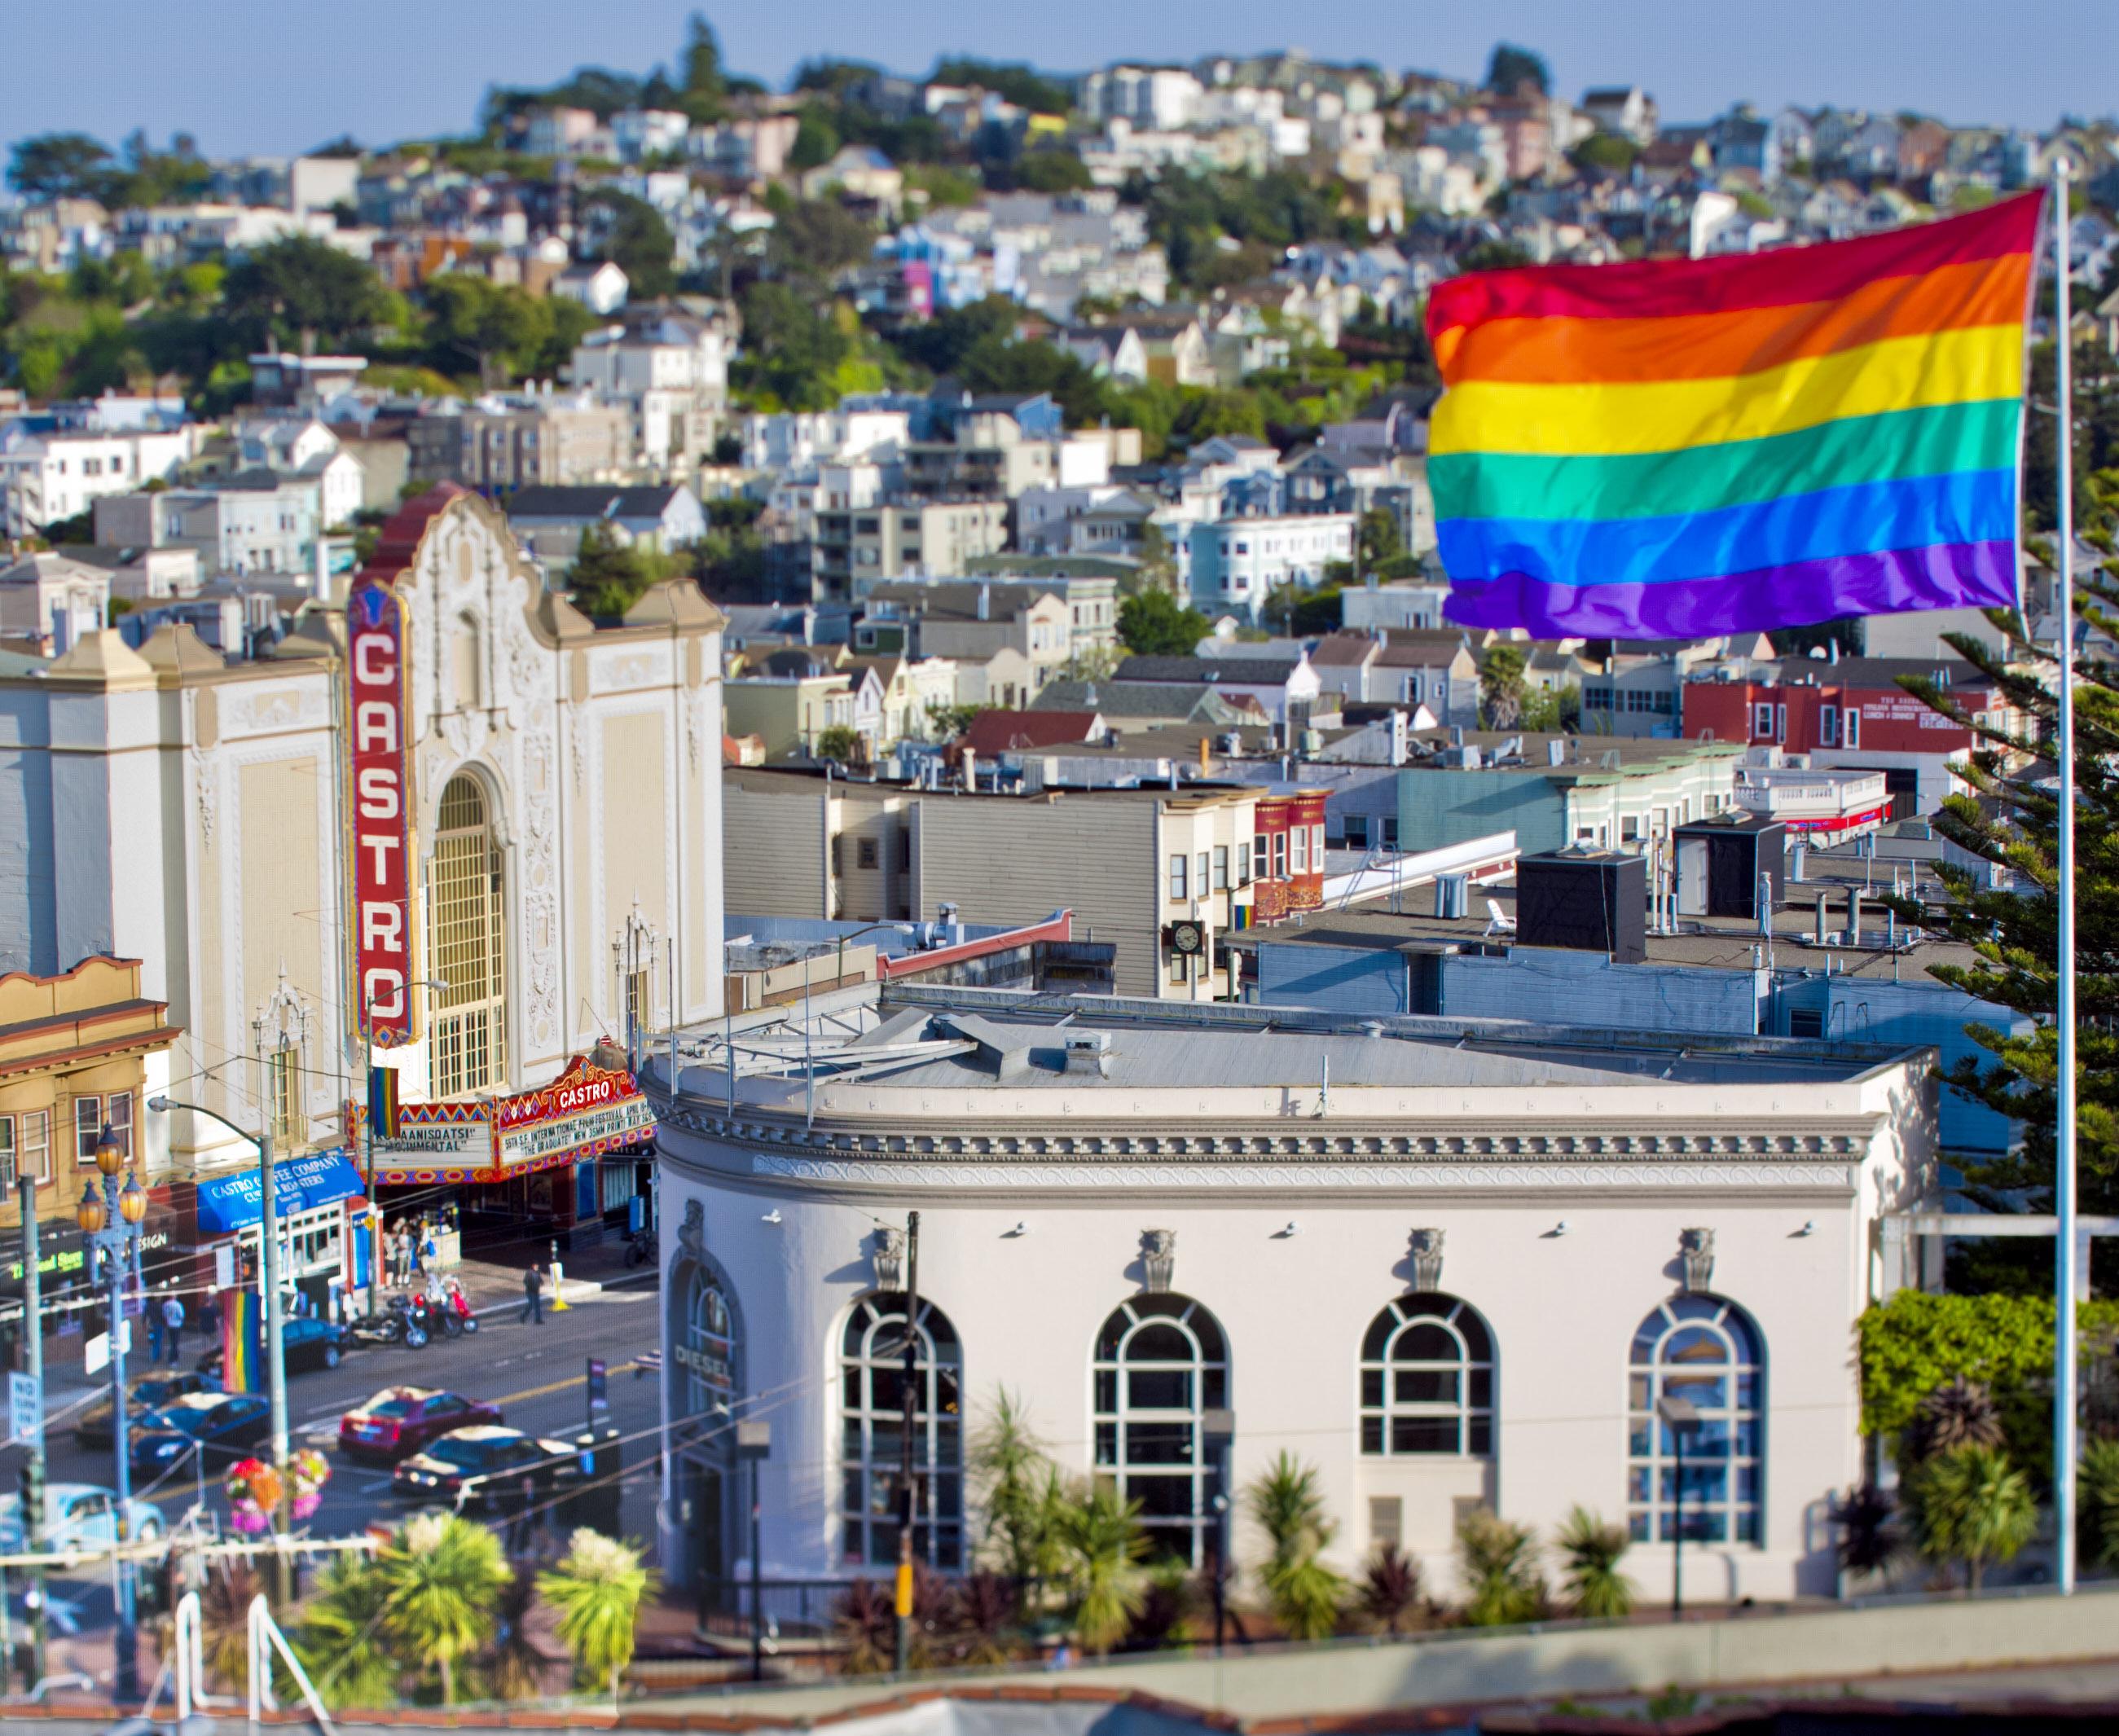 San Francisco's Castro neighborhood